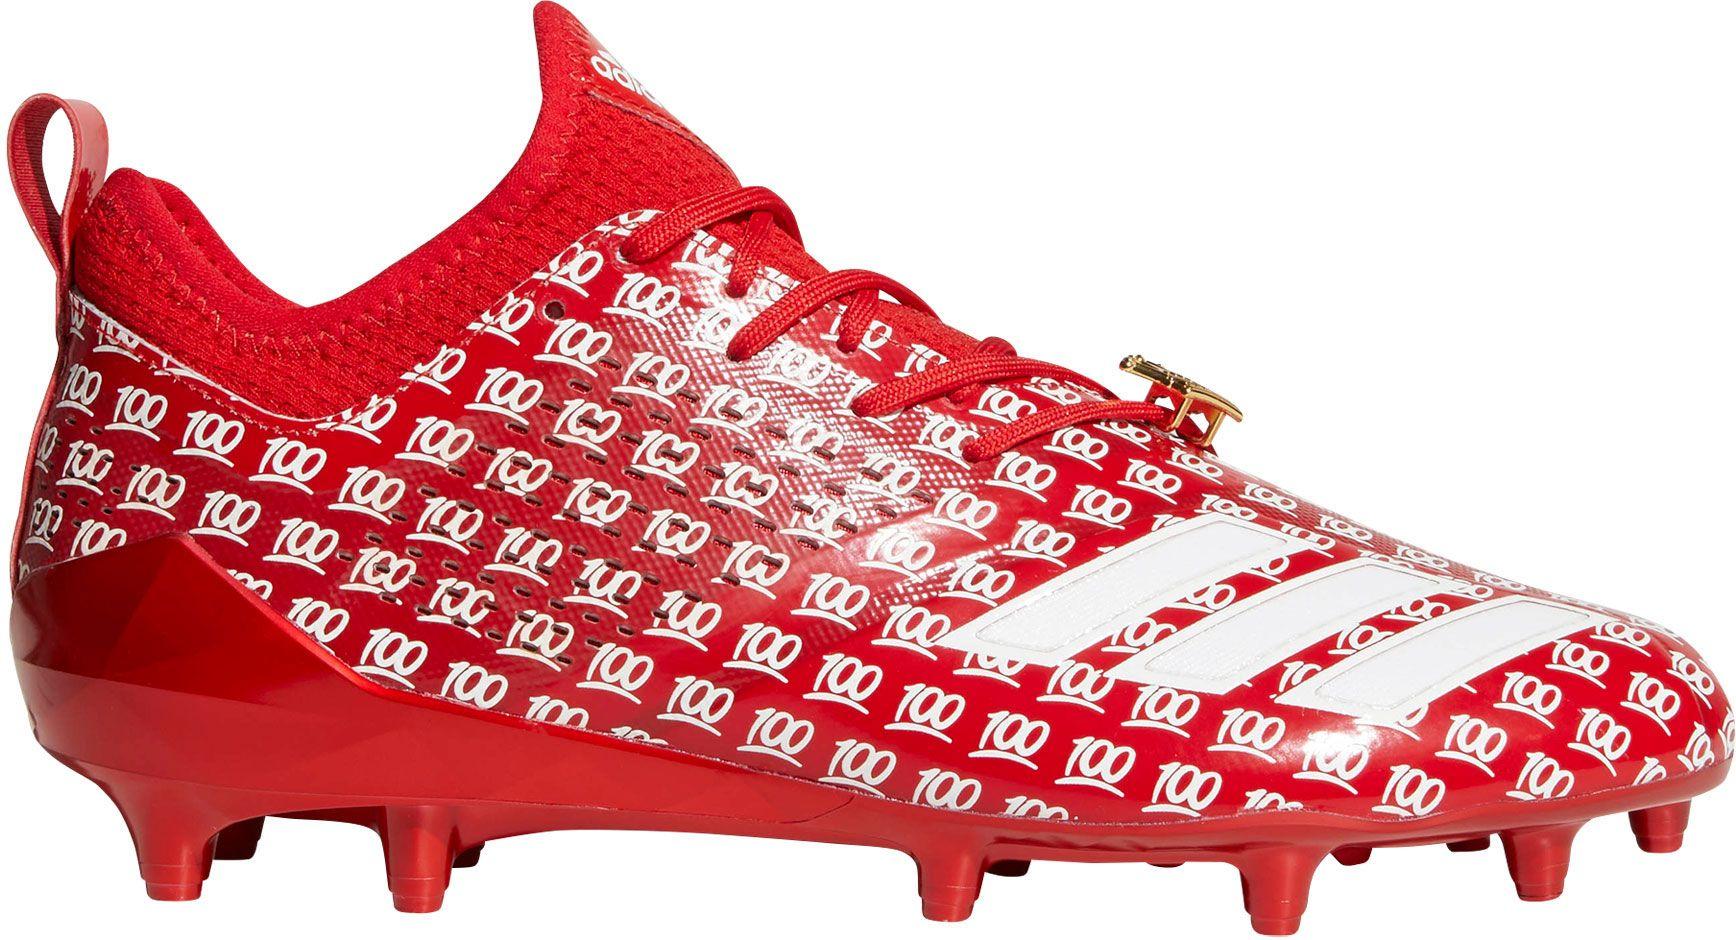 adidas football cleats noimagefound ??? MWZLJWL